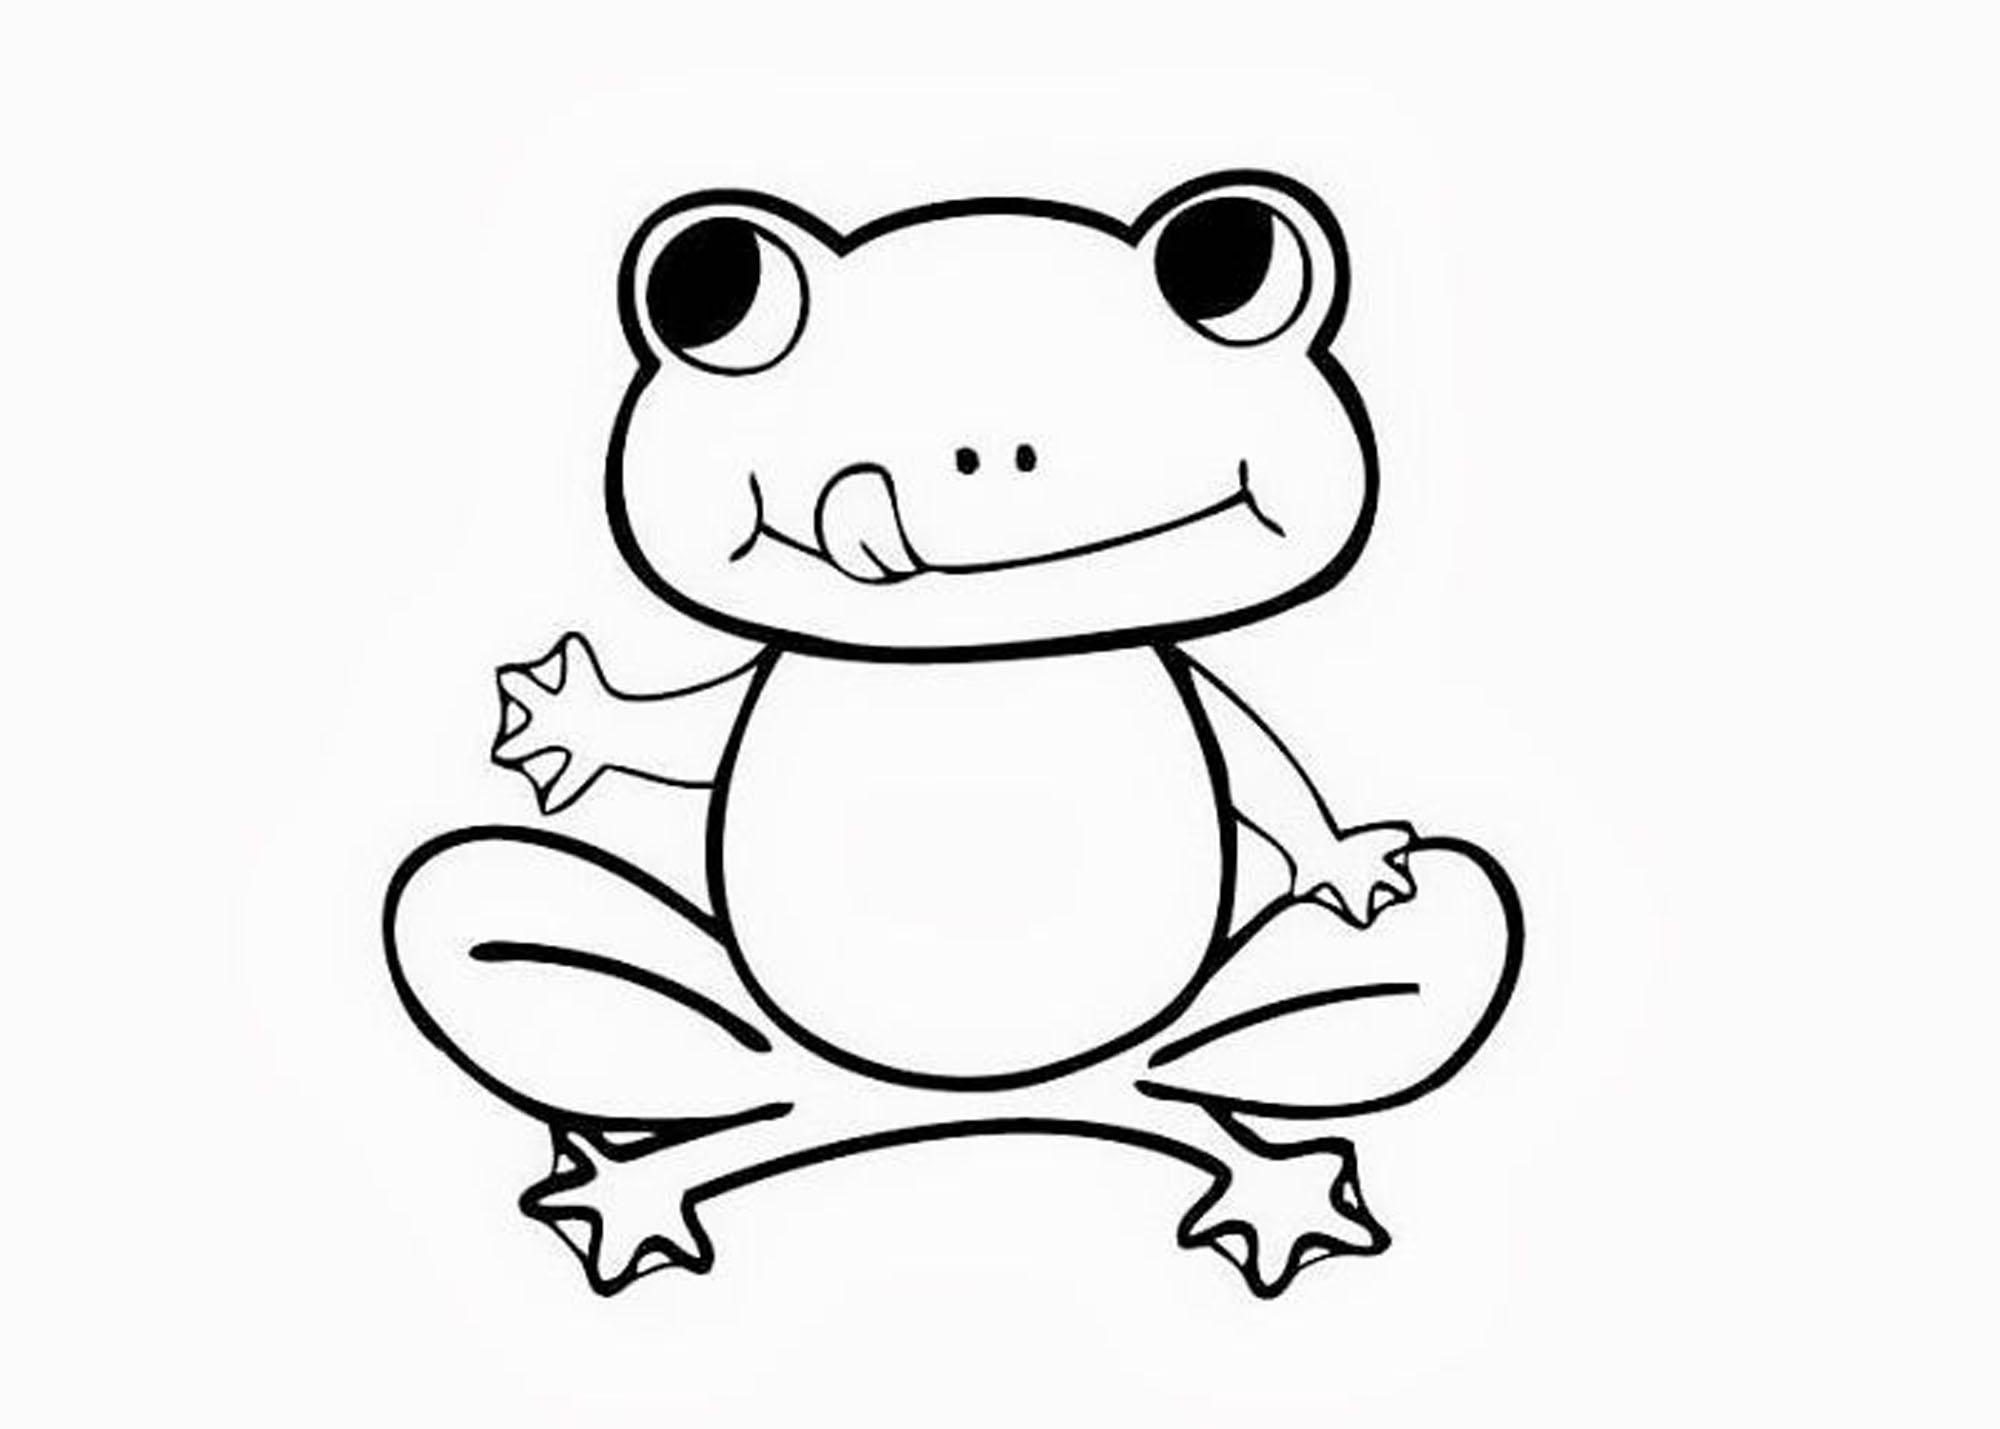 Kermit The Frog Drawing At Getdrawings